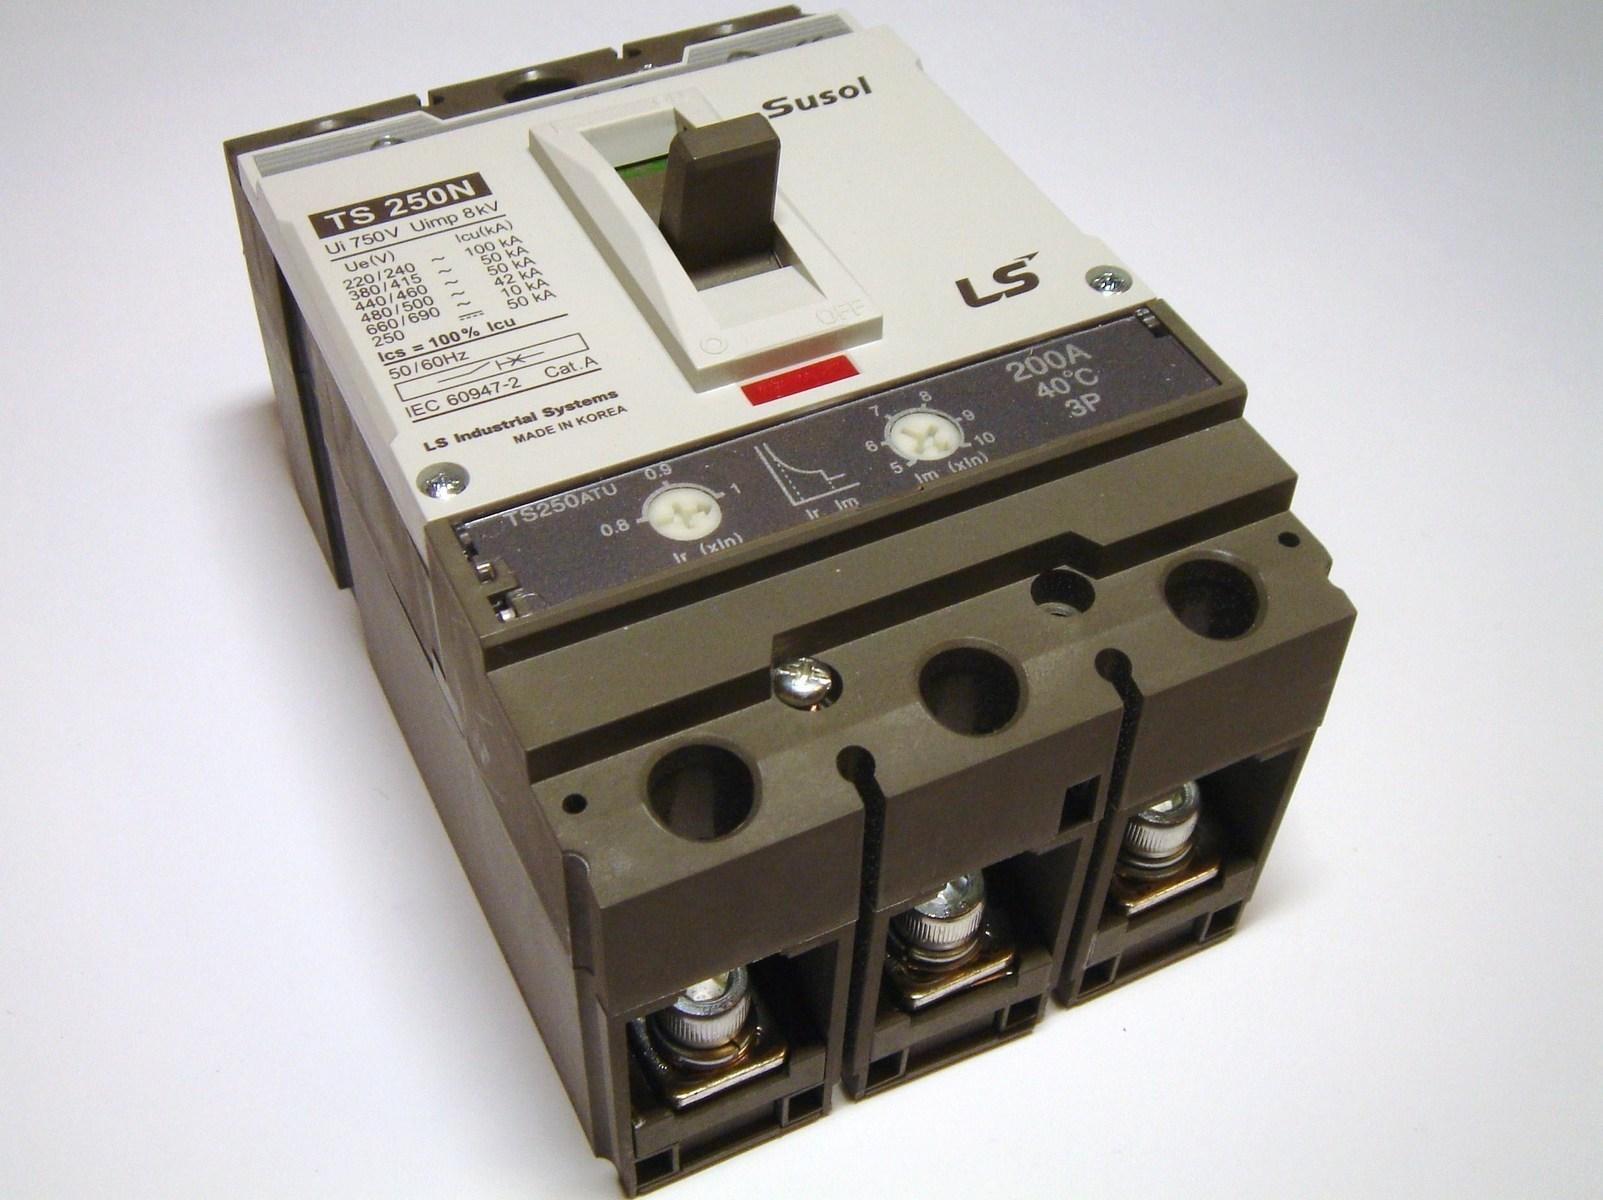 Kaitselüliti 3-faasiline, 200A, Susol, TS250ATU, LS Industrial Systems